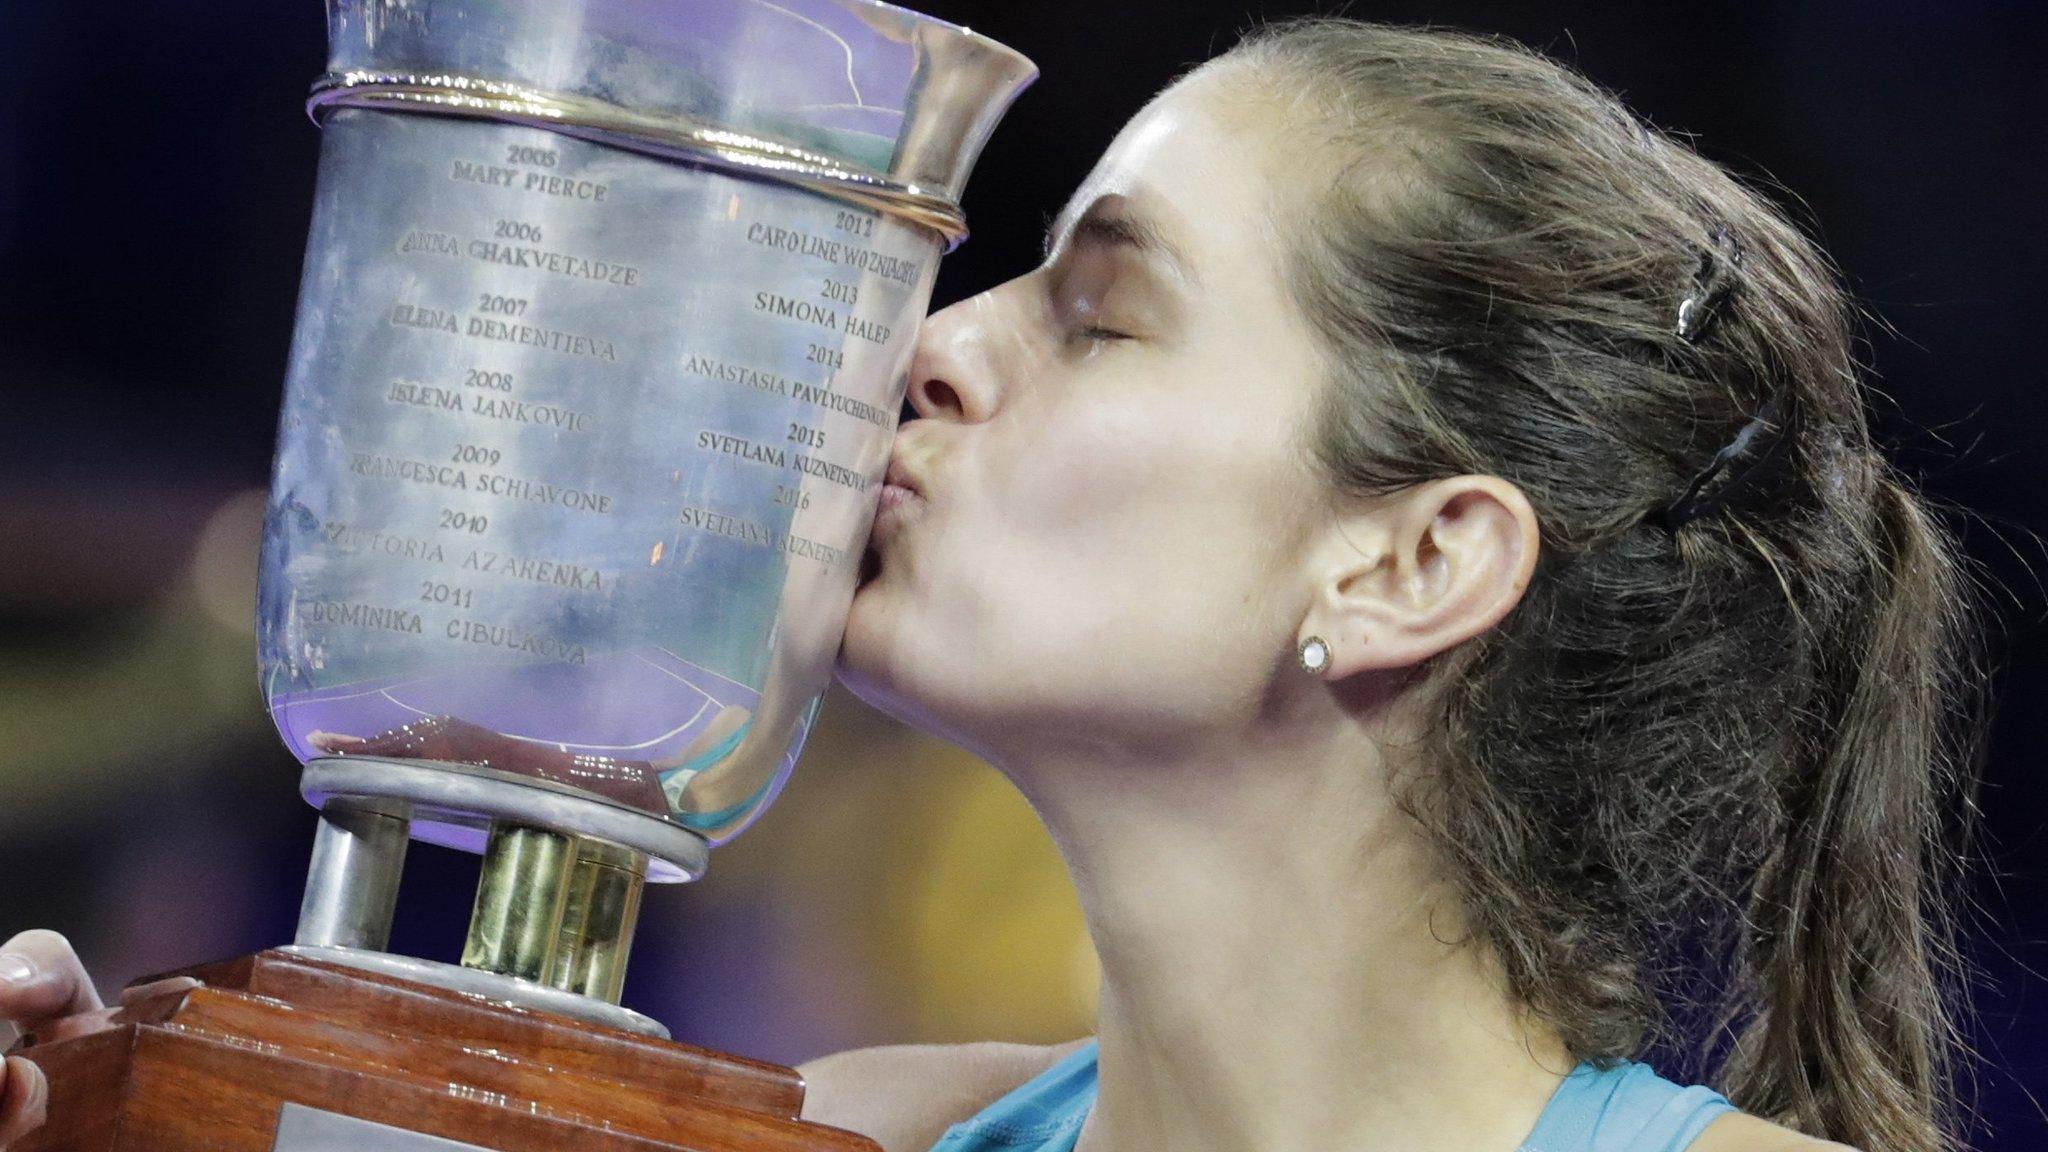 Kremlin Cup: Julia Goerges beats Daria Kasatkina to claim third WTA title